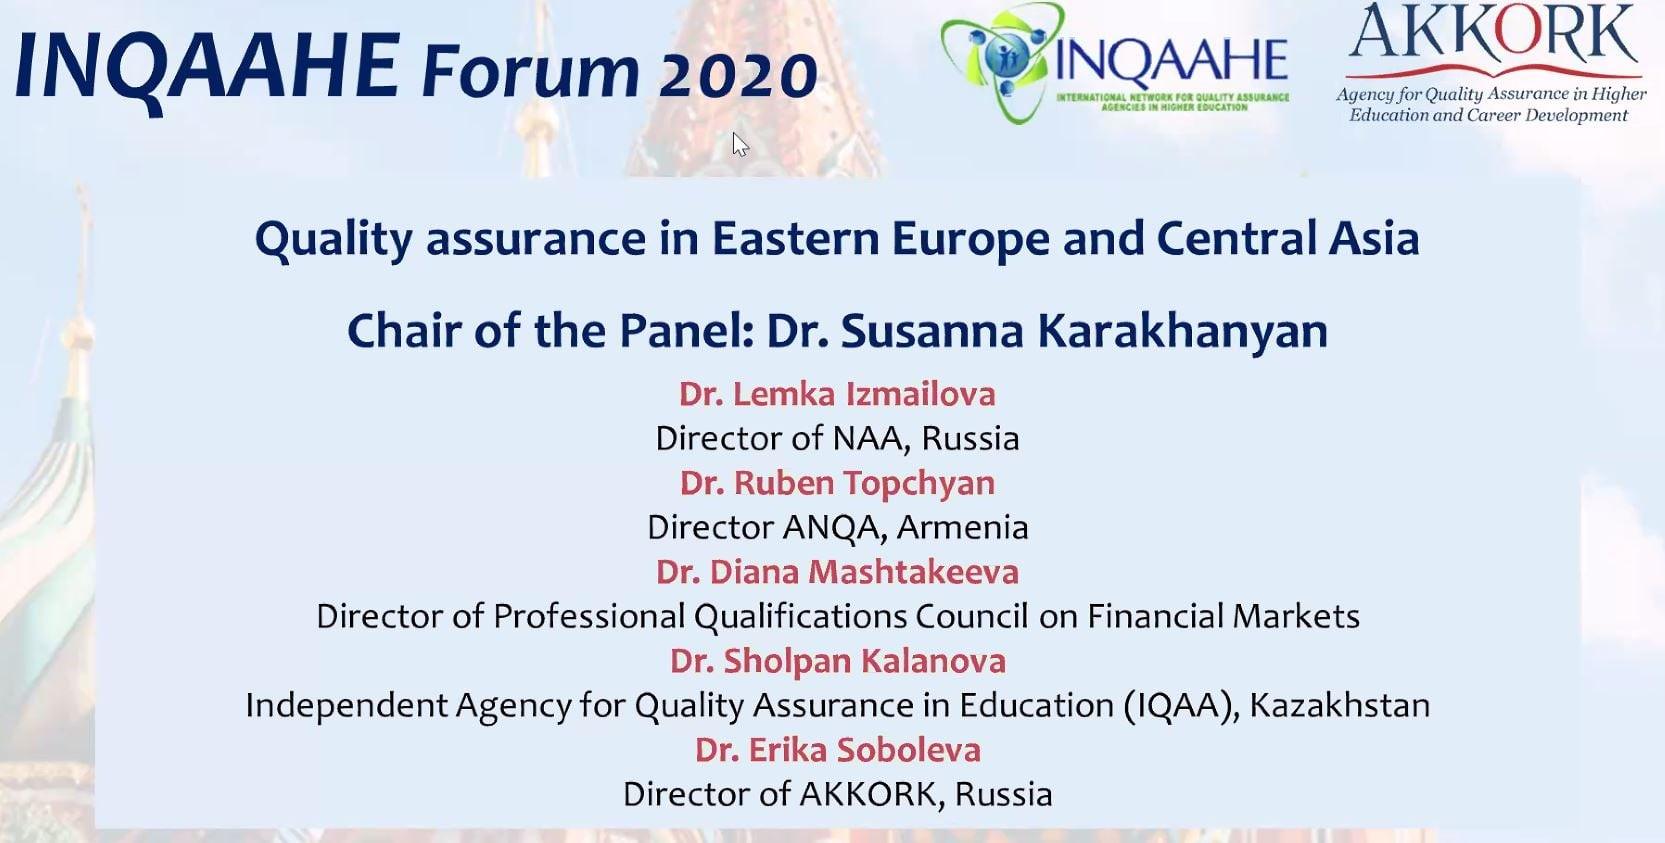 inqaahe forum 1